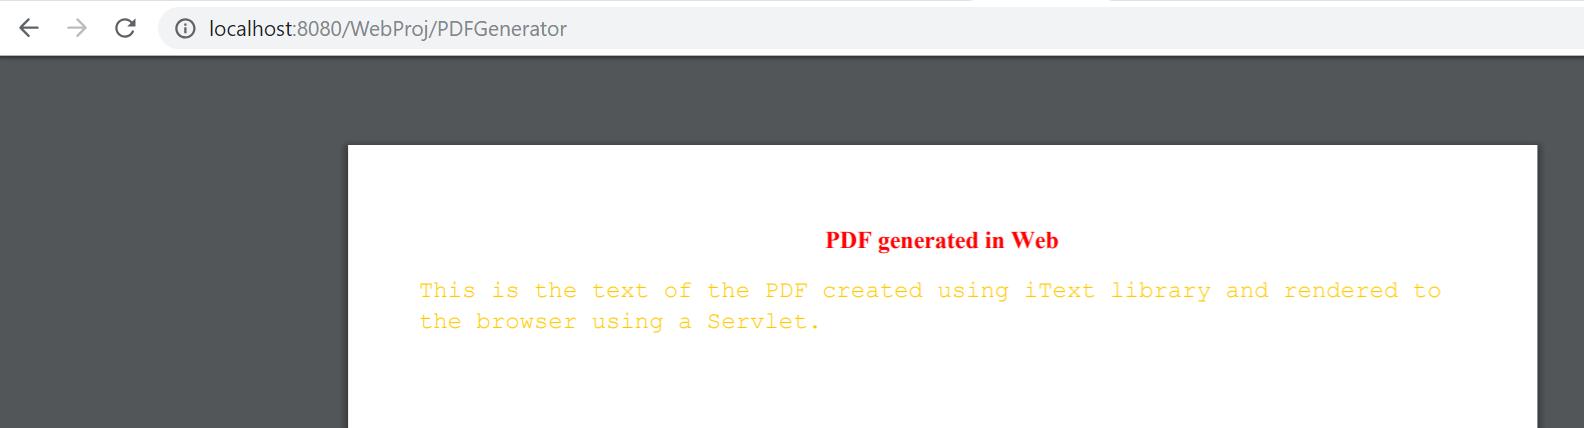 Creating PDF in Java Using iText | Tech Tutorials